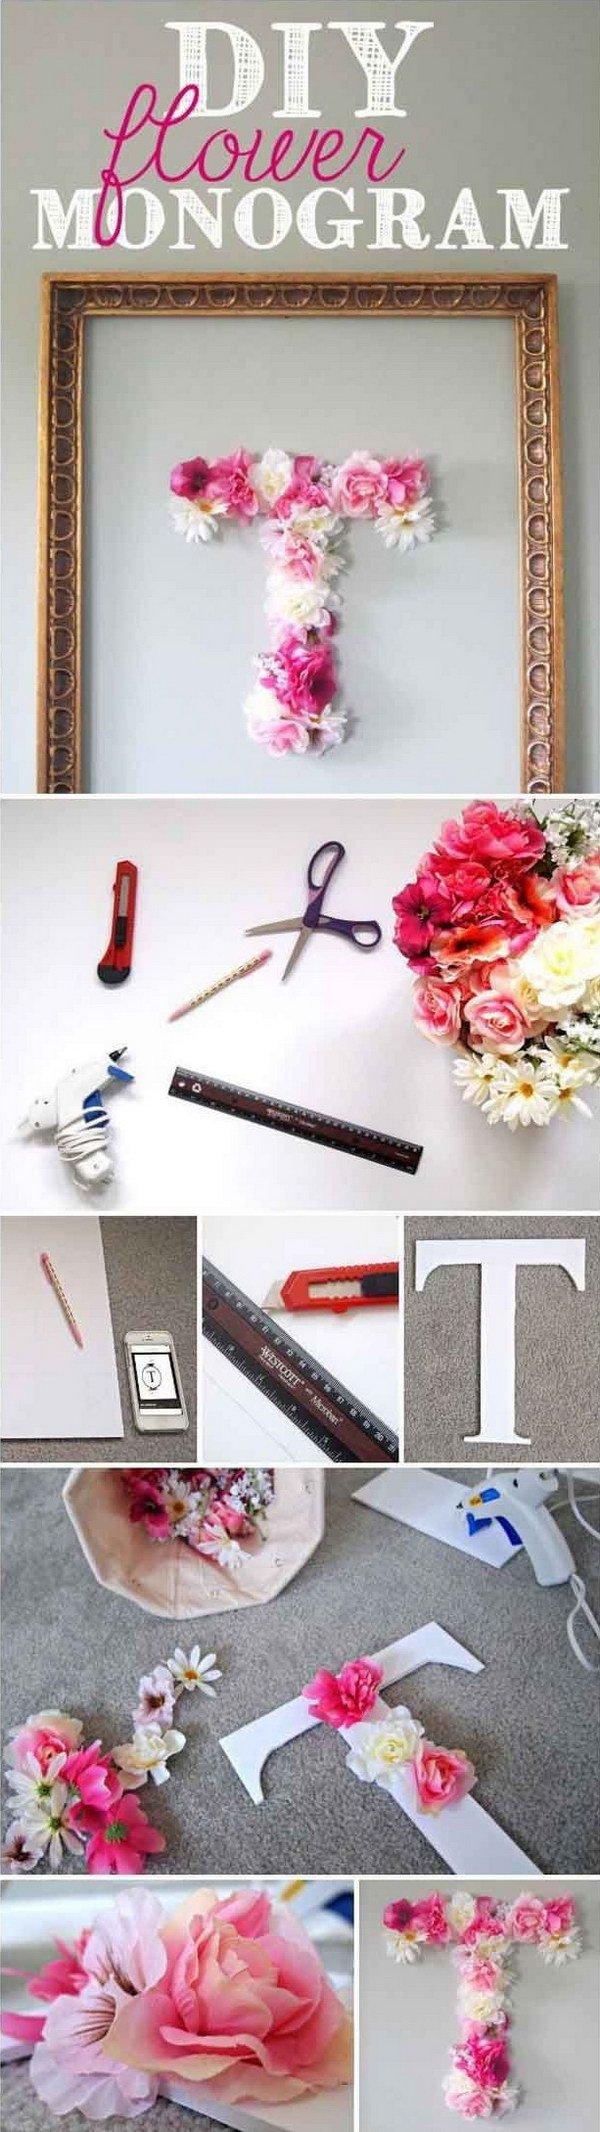 Cute Diy Room Decor Ideas Beautiful 25 Diy Ideas & Tutorials for Teenage Girl S Room Decoration 2017